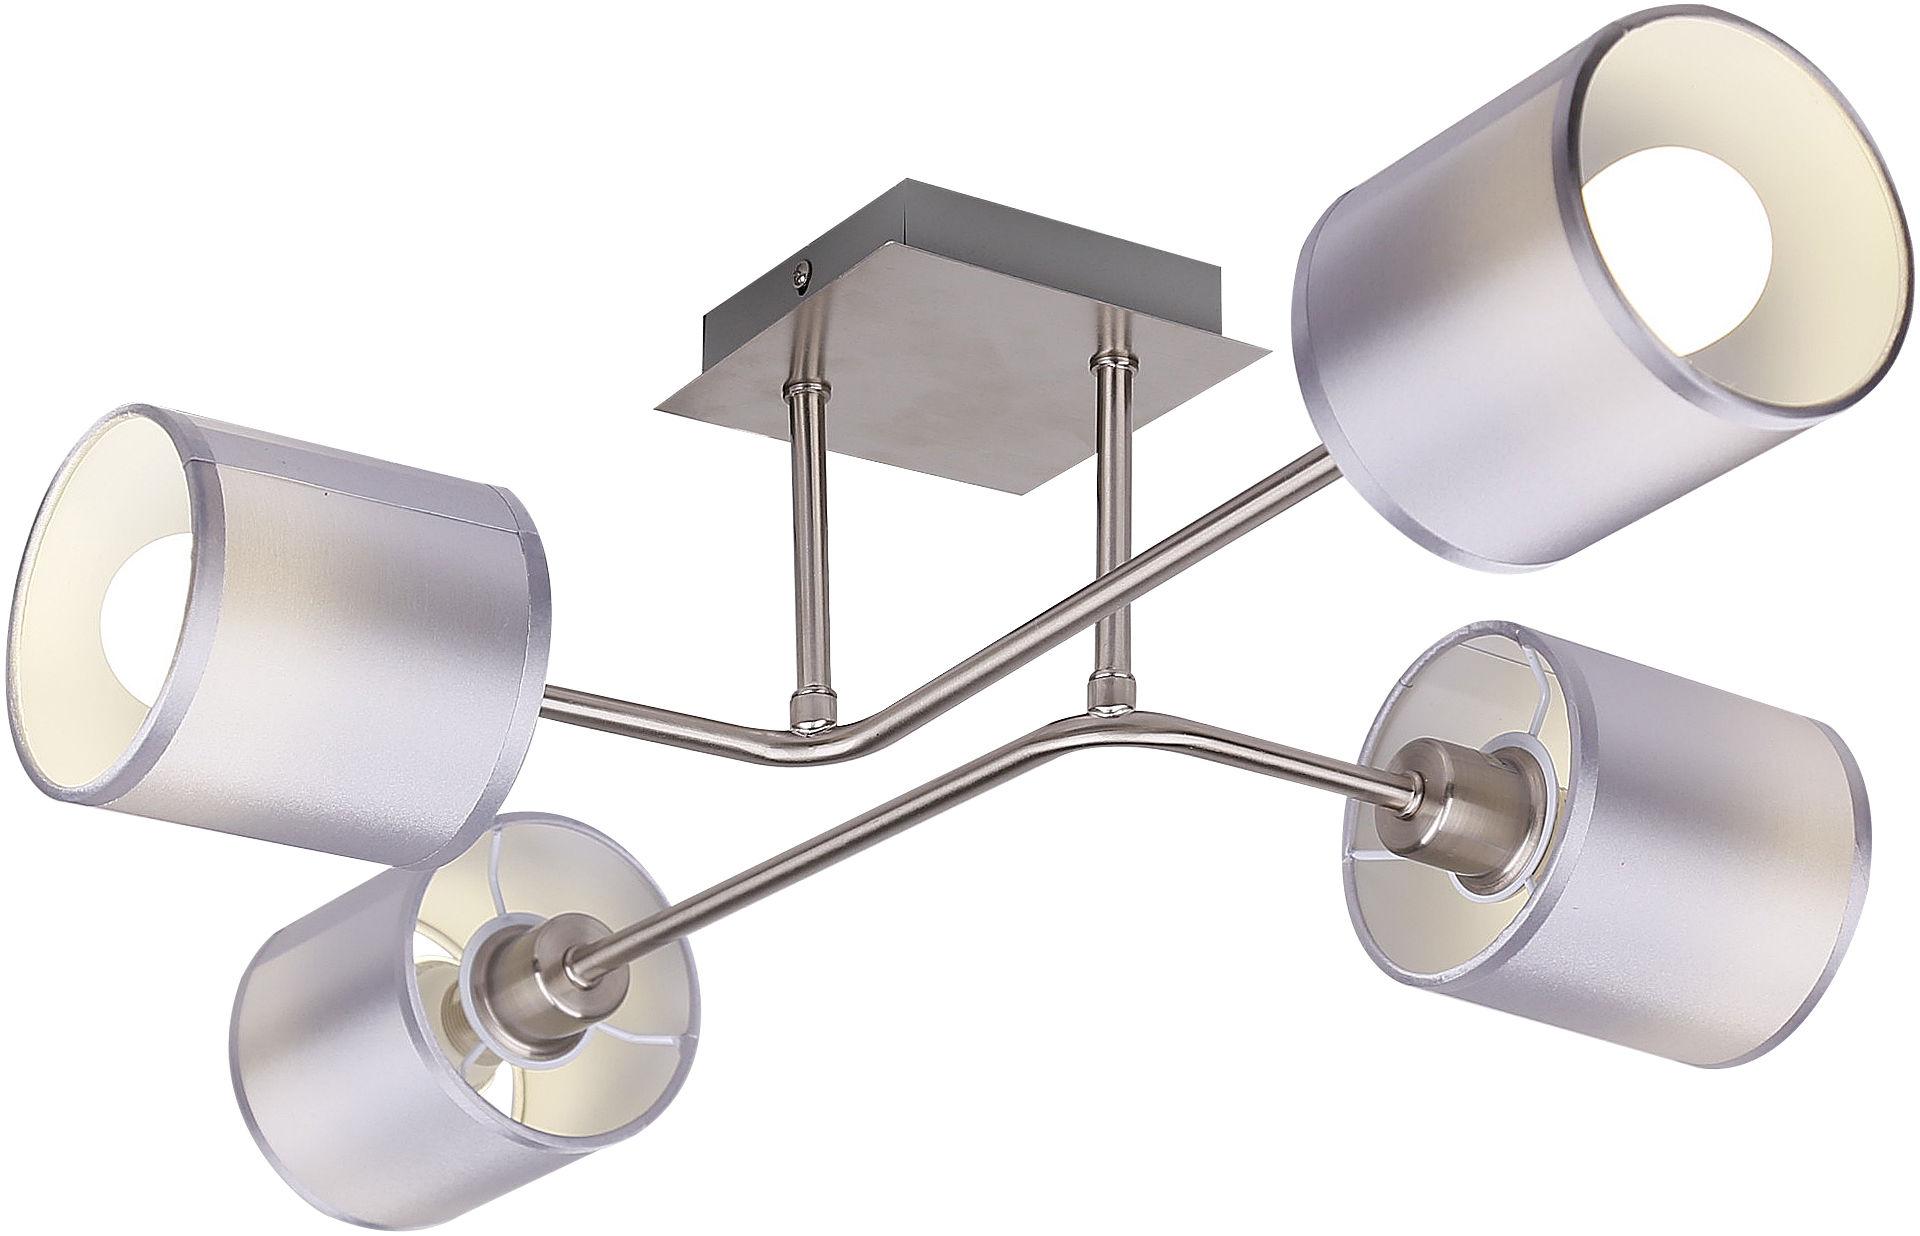 Candellux SAX 34-70685 plafon lampa sufitowa abażur 4x40W E14 69cm